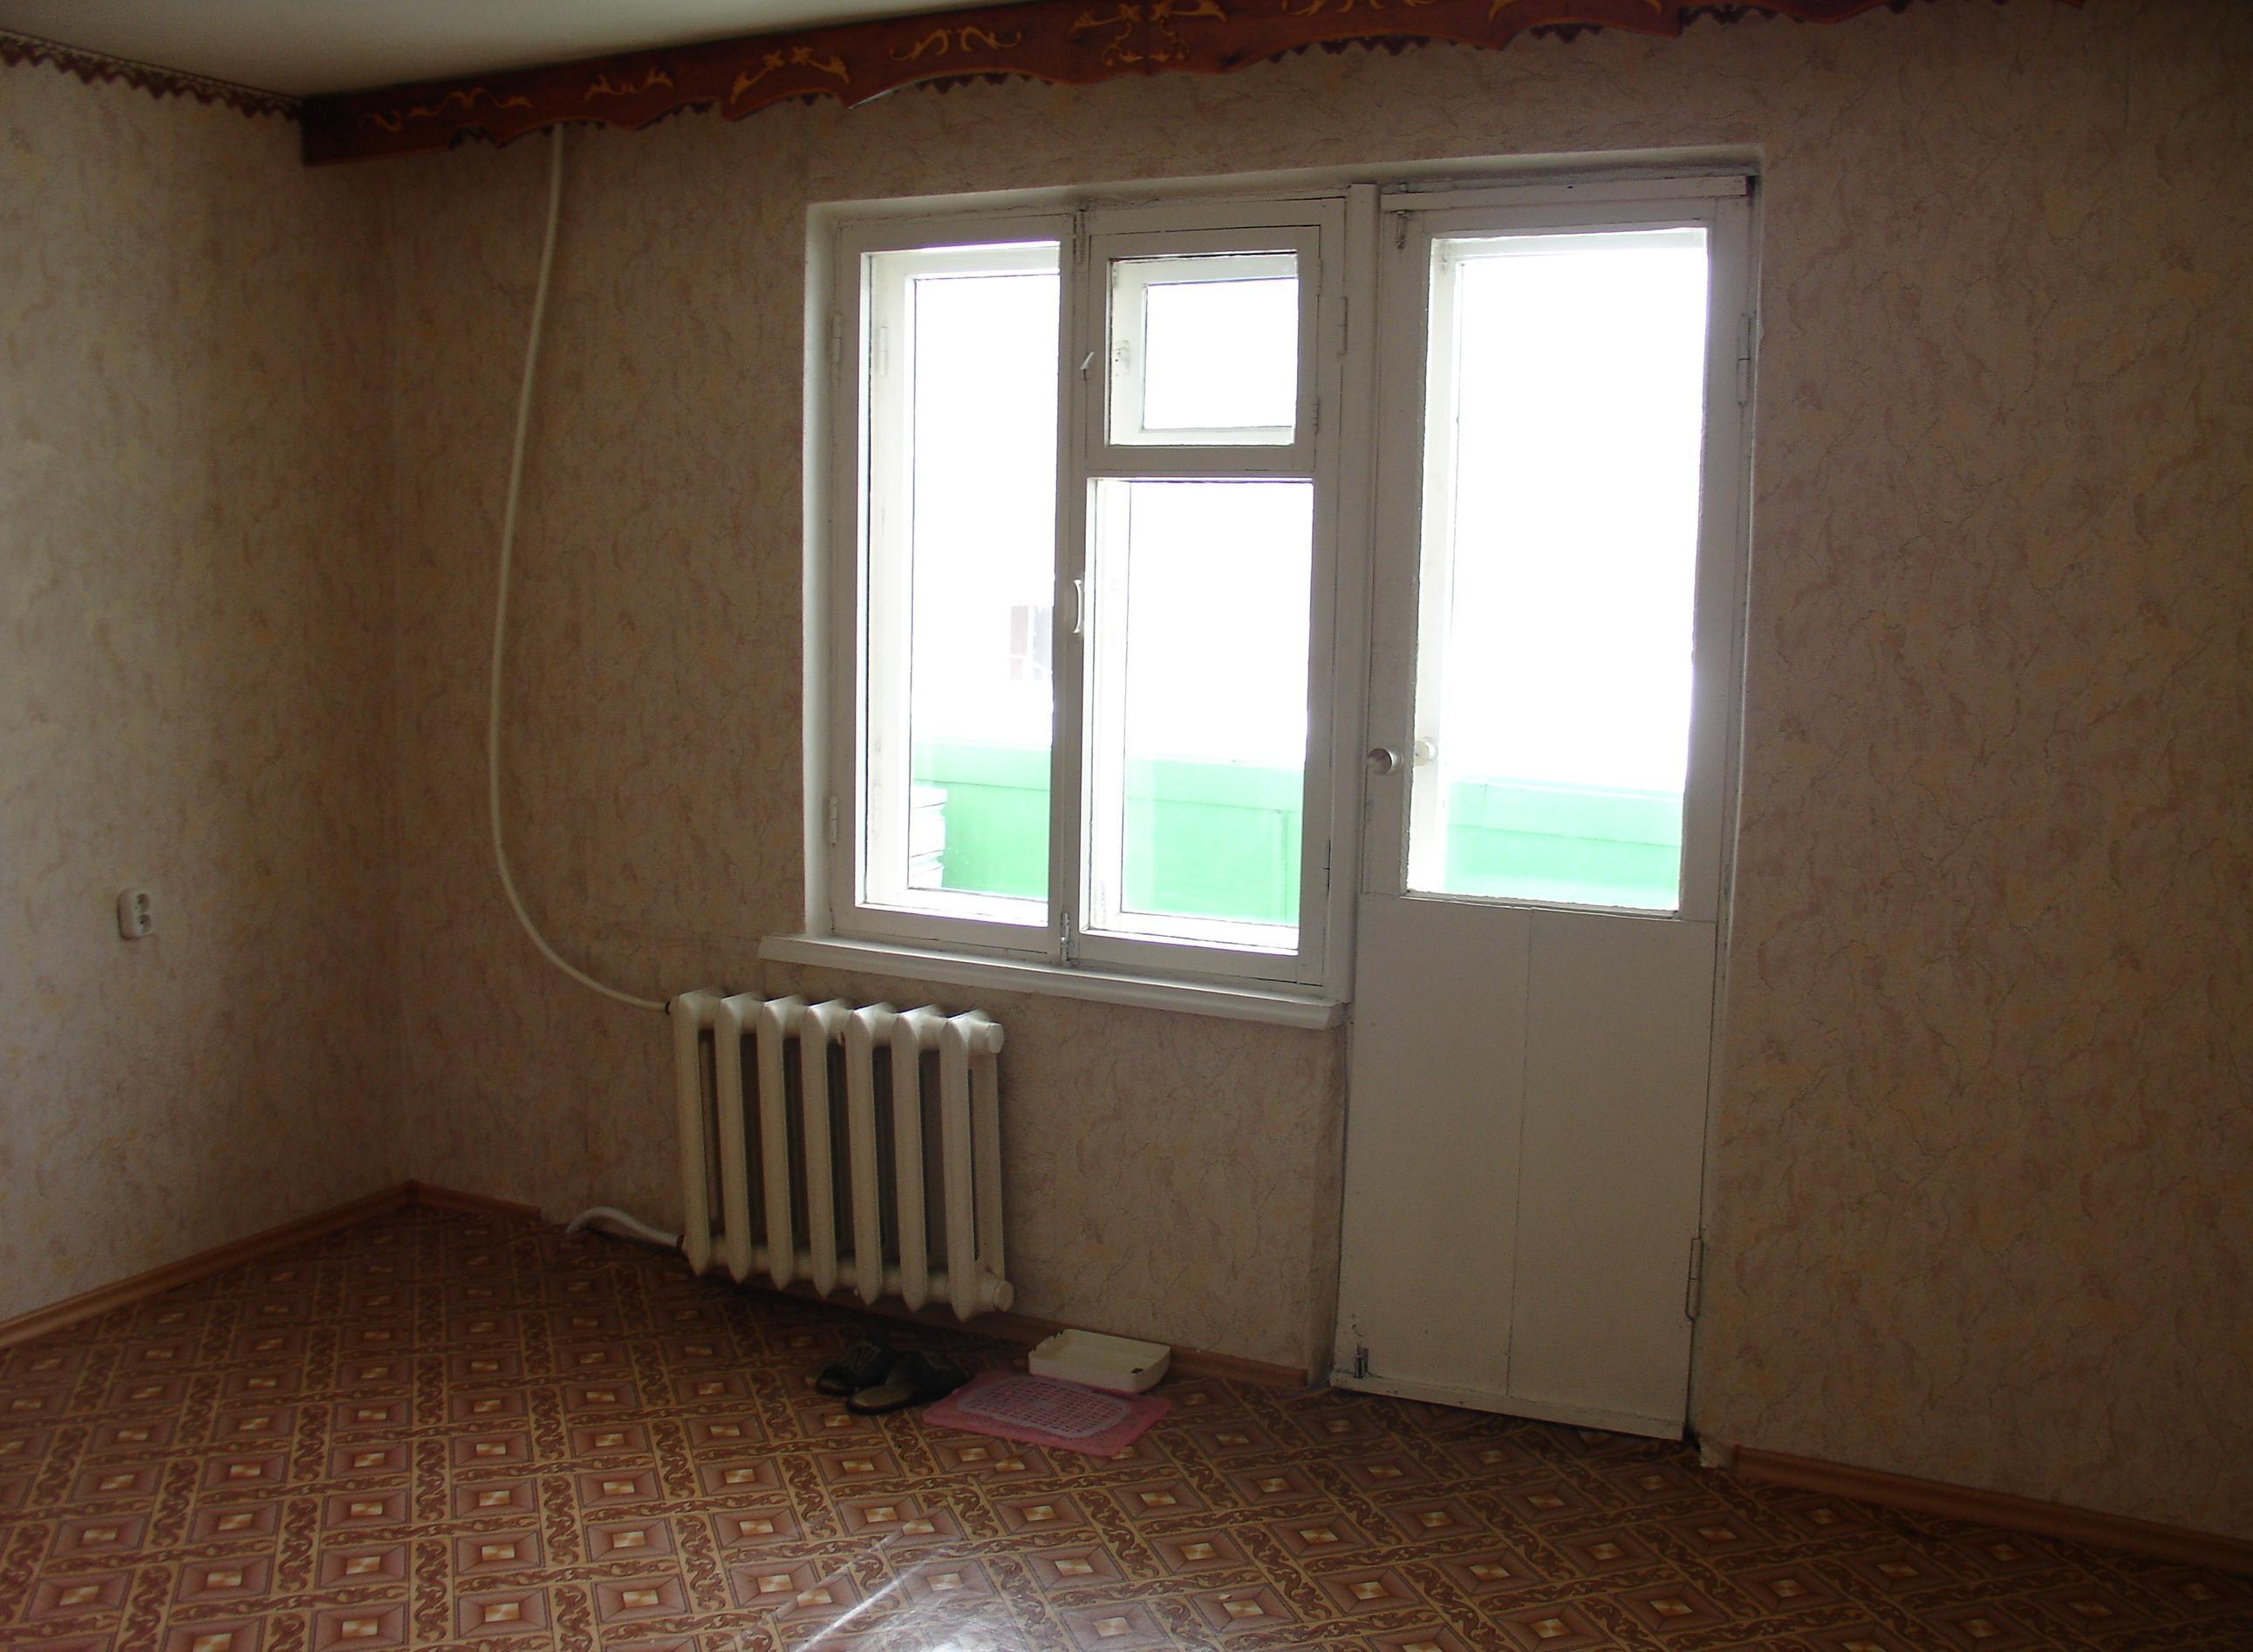 1-к квартира   Краснодар, Олпийская, р-н ФМР, 4 фото - 1